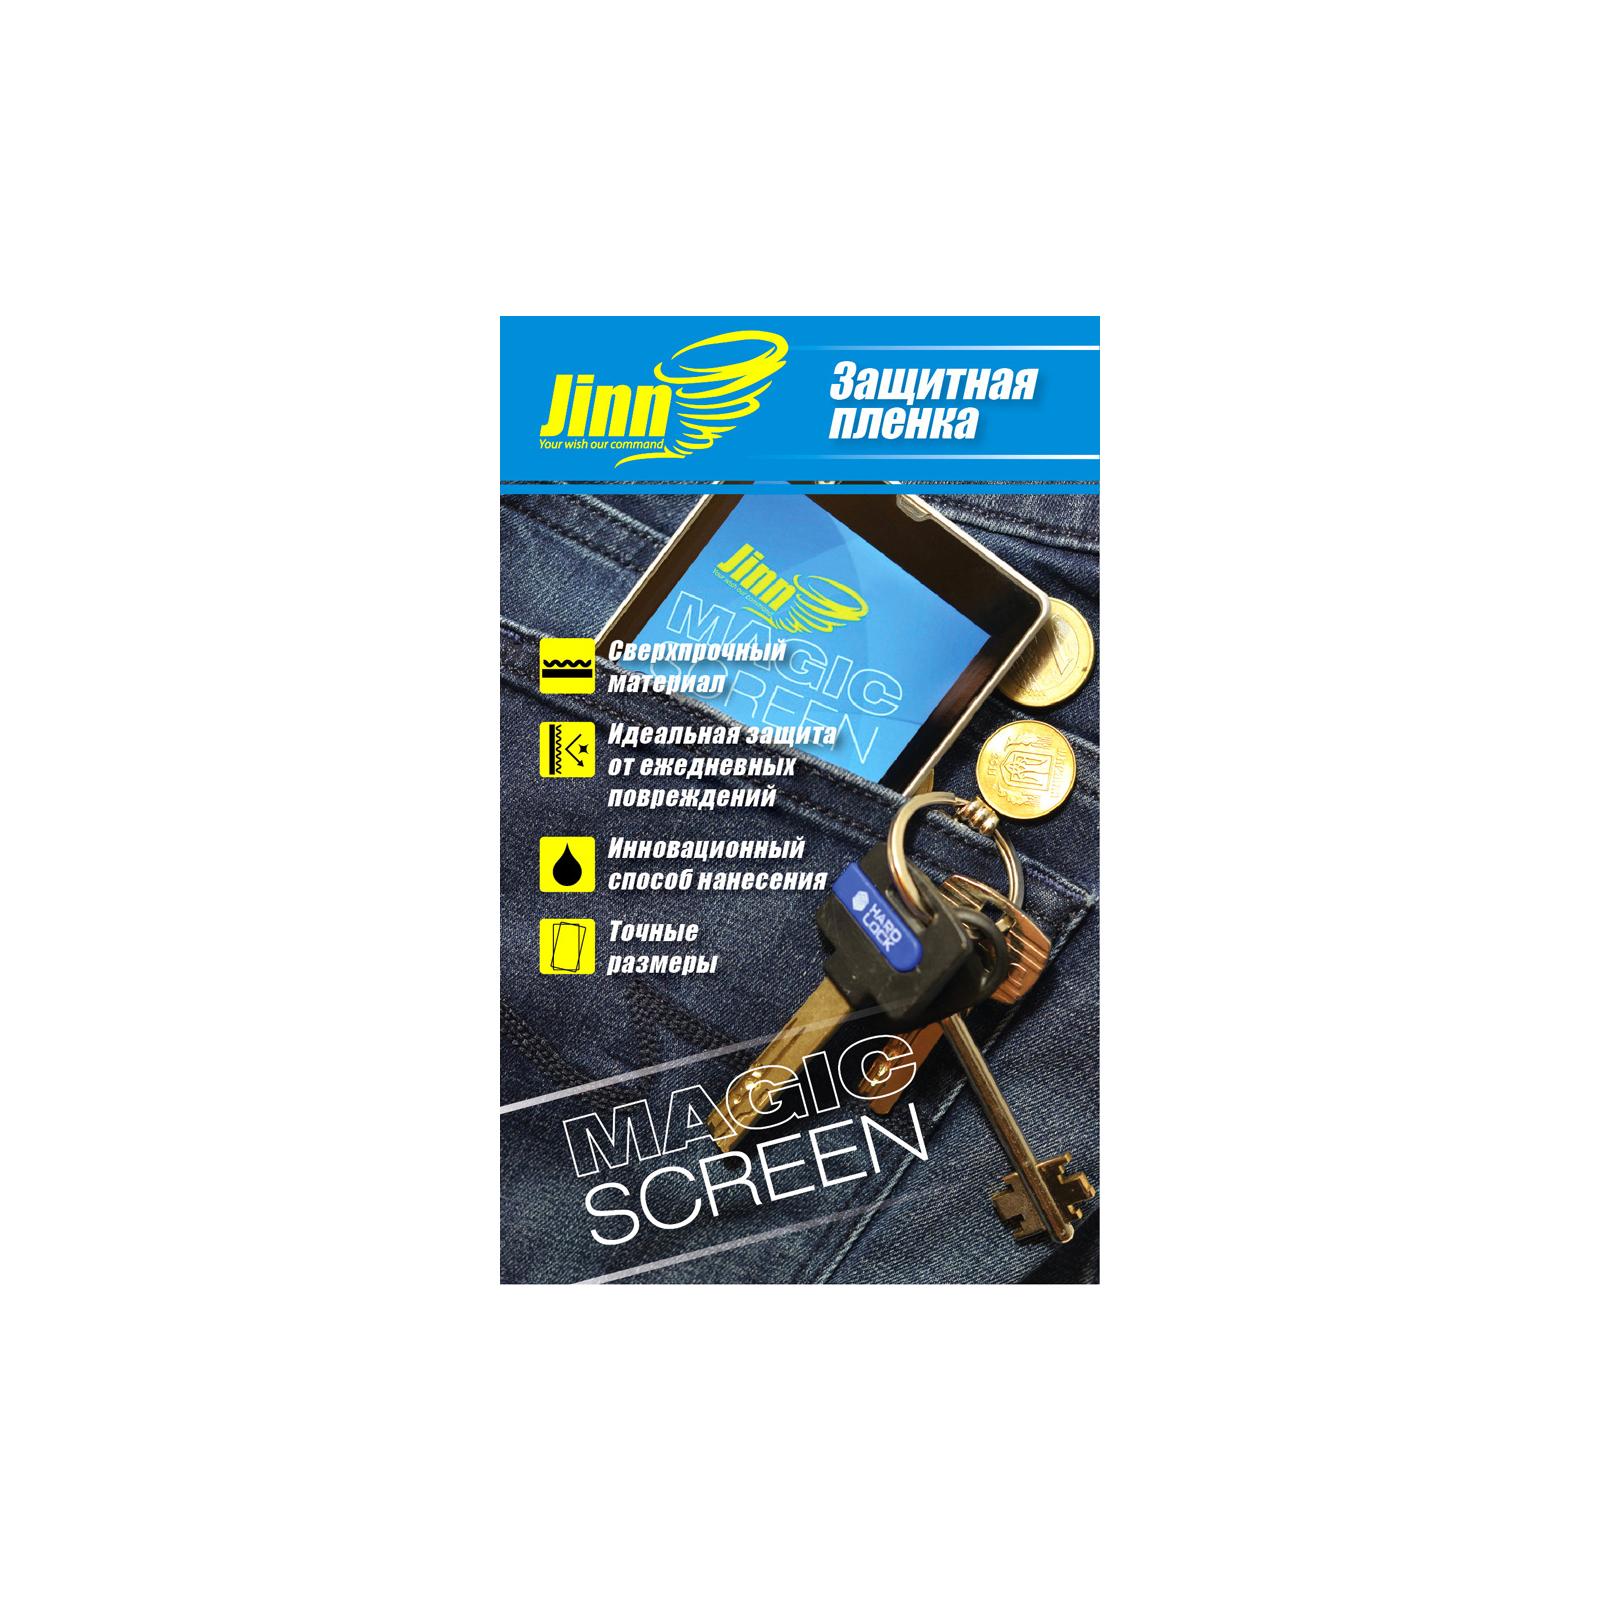 Пленка защитная JINN ультрапрочная Magic Screen для Fly IQ4411 Energie 2 (Fly IQ4411 Energie 2 front)